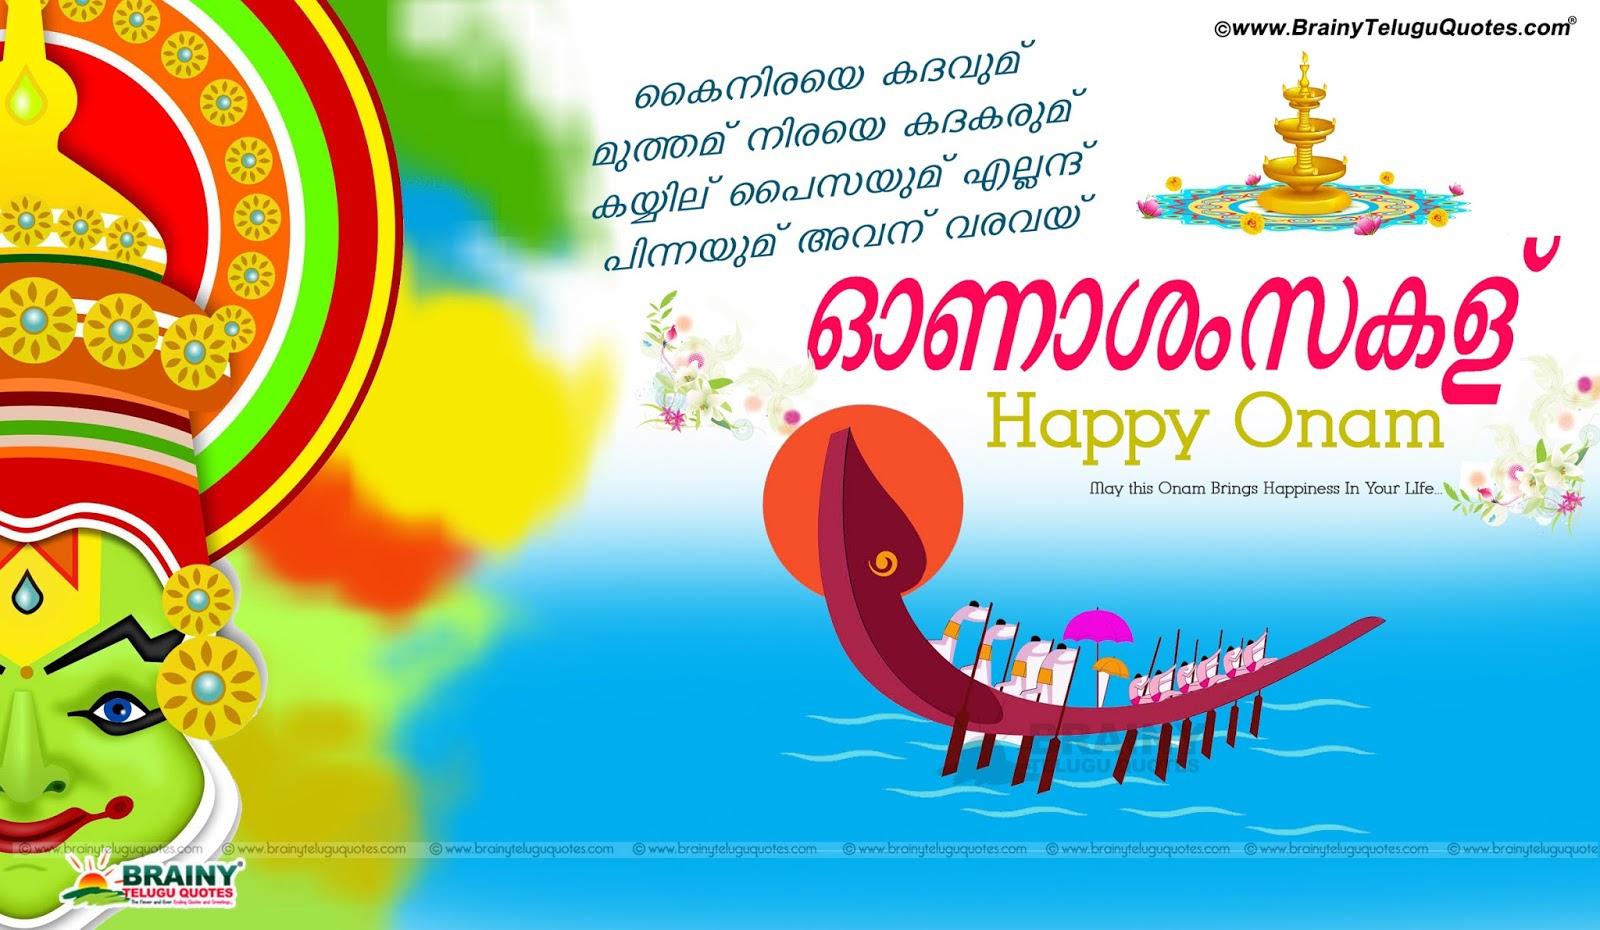 Onam wishes in malayalam onam ashamshagal onam hd wallpapers onam here is best onam greetings in malayalam best onam quotes in malayalam best onam m4hsunfo